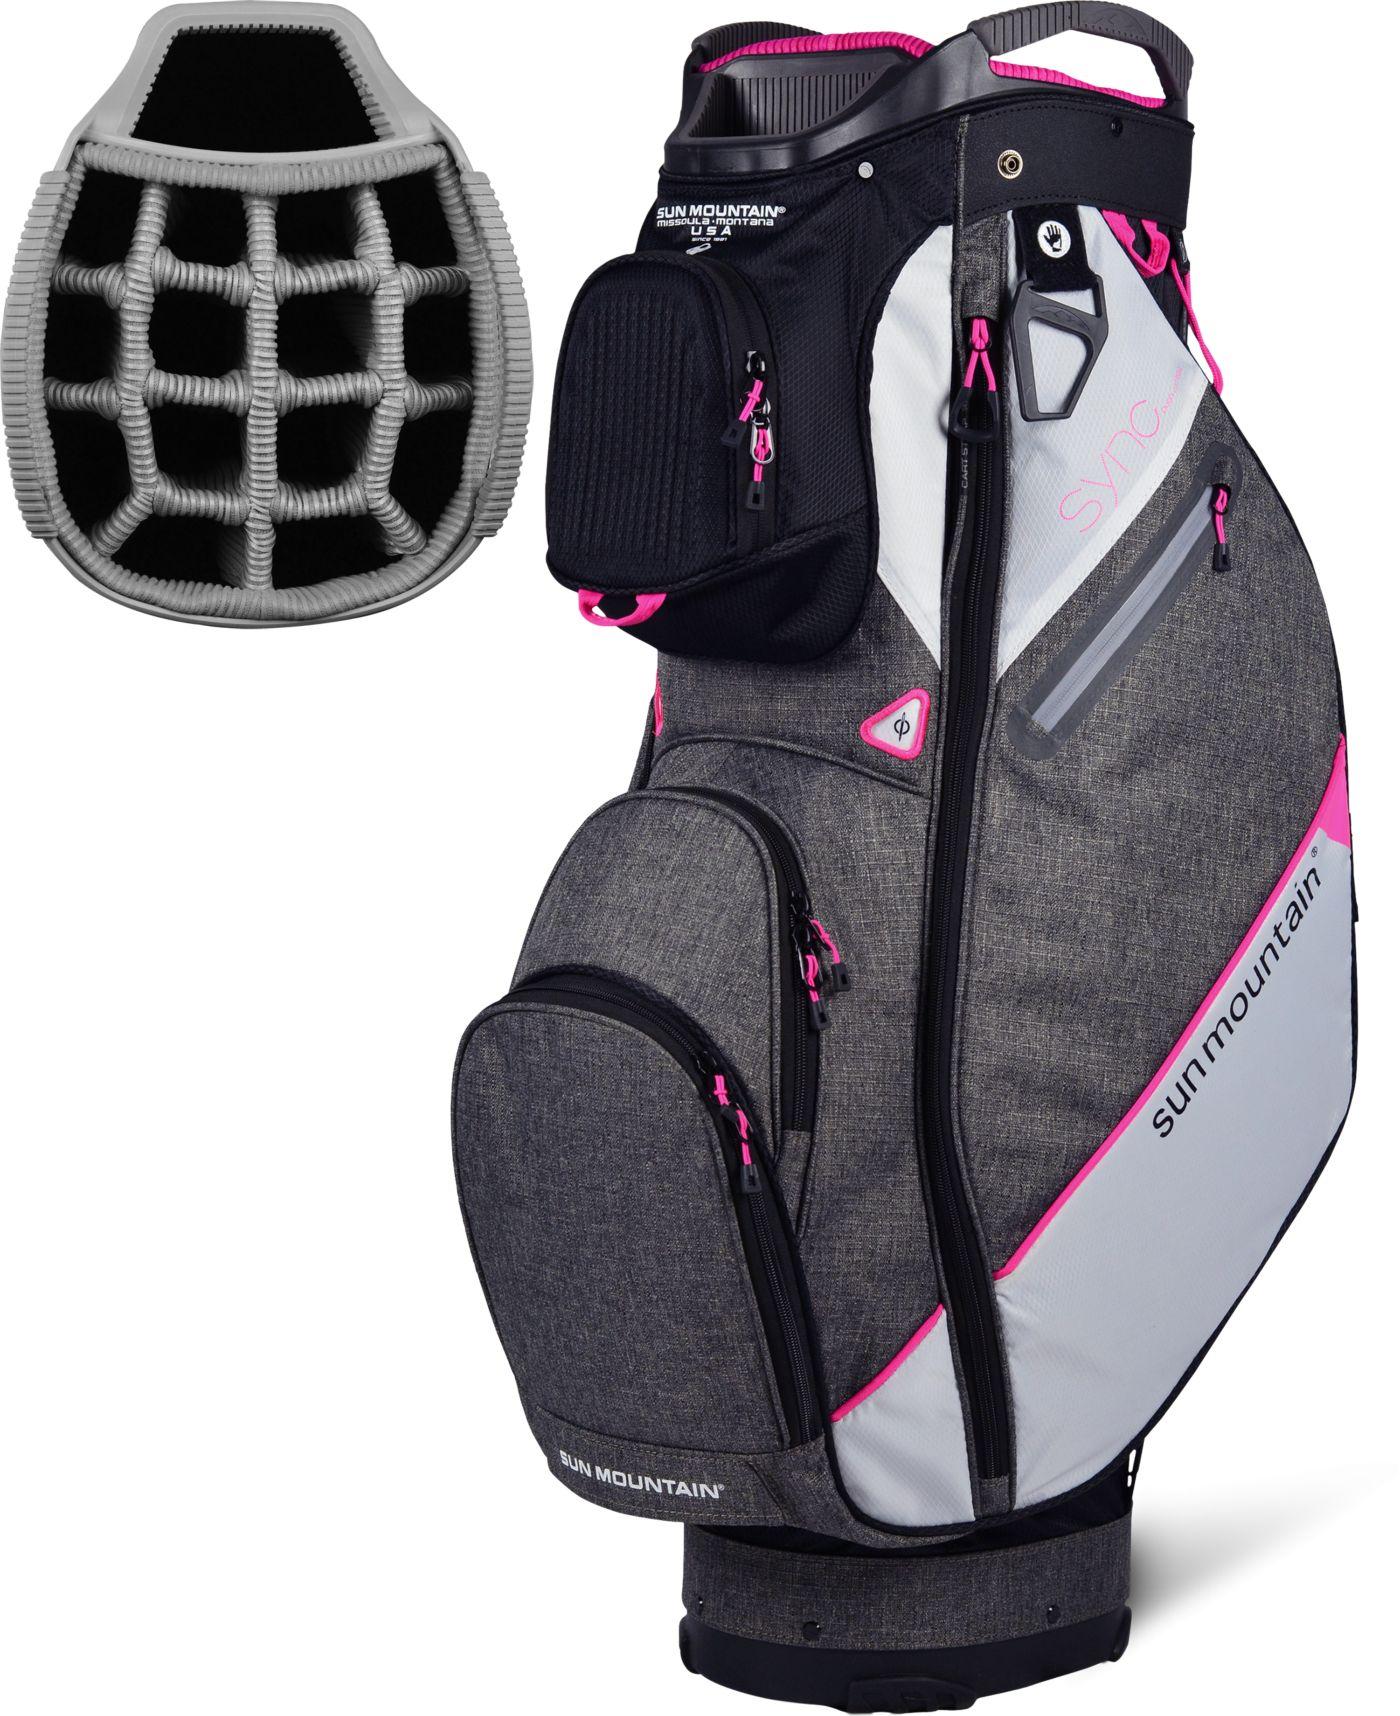 Sun Mountain Women's 2019 Sync Cart Bag